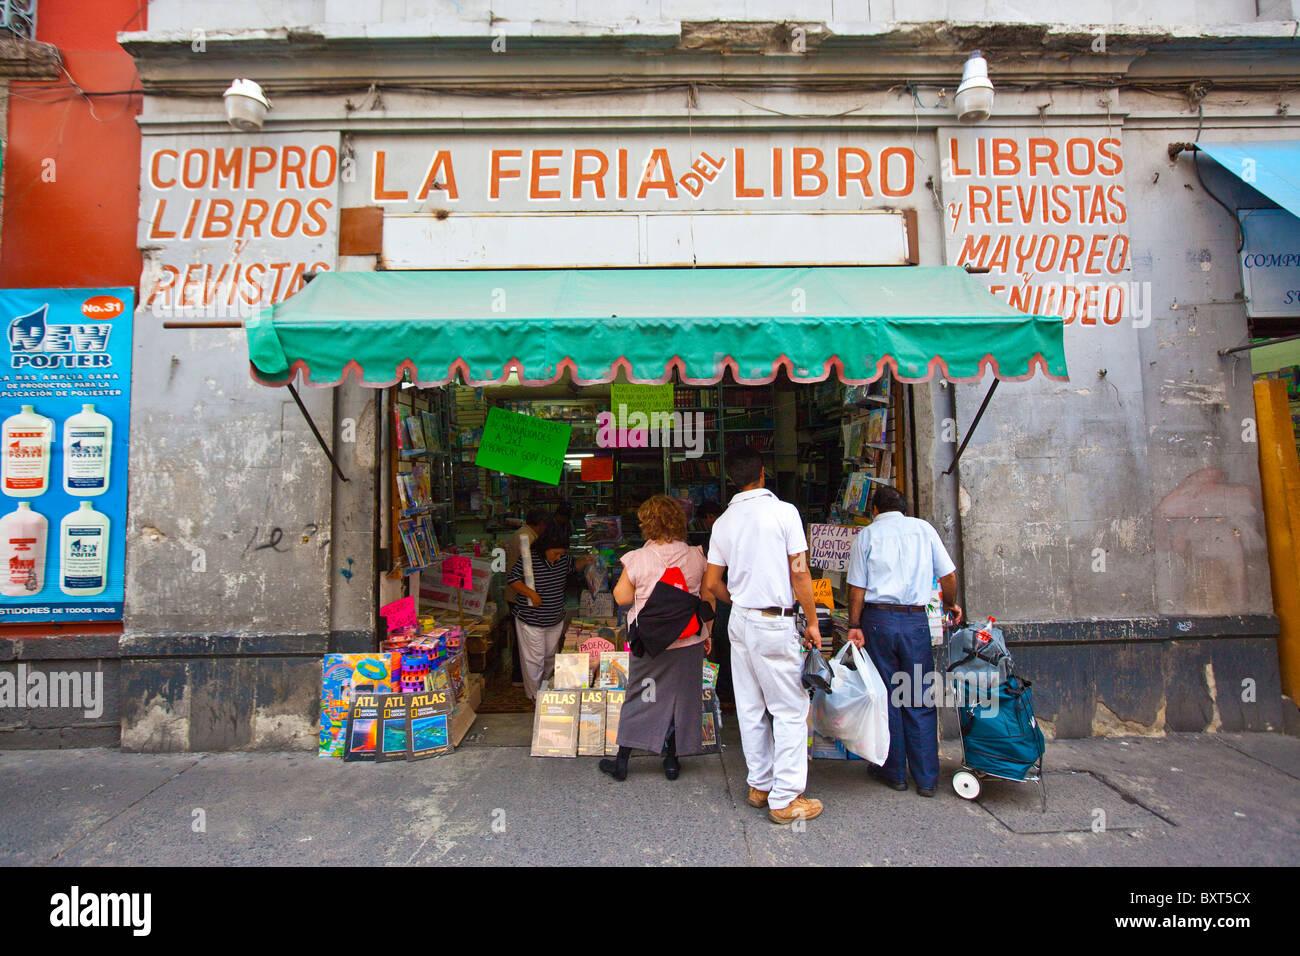 Bookstore in Mexico City, Mexico - Stock Image